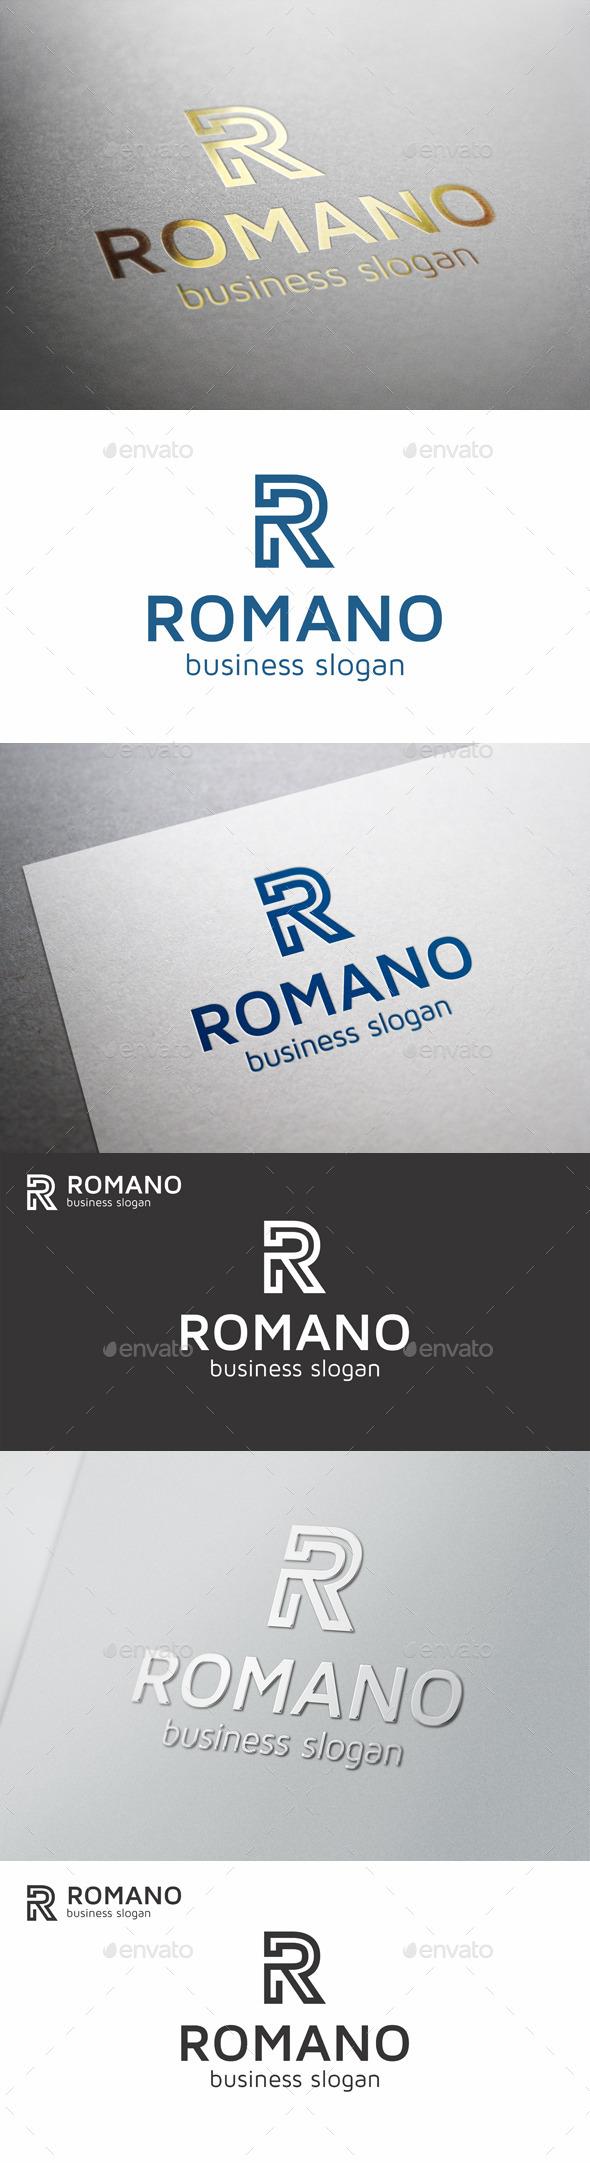 R Letter Monogram Logo - Romano